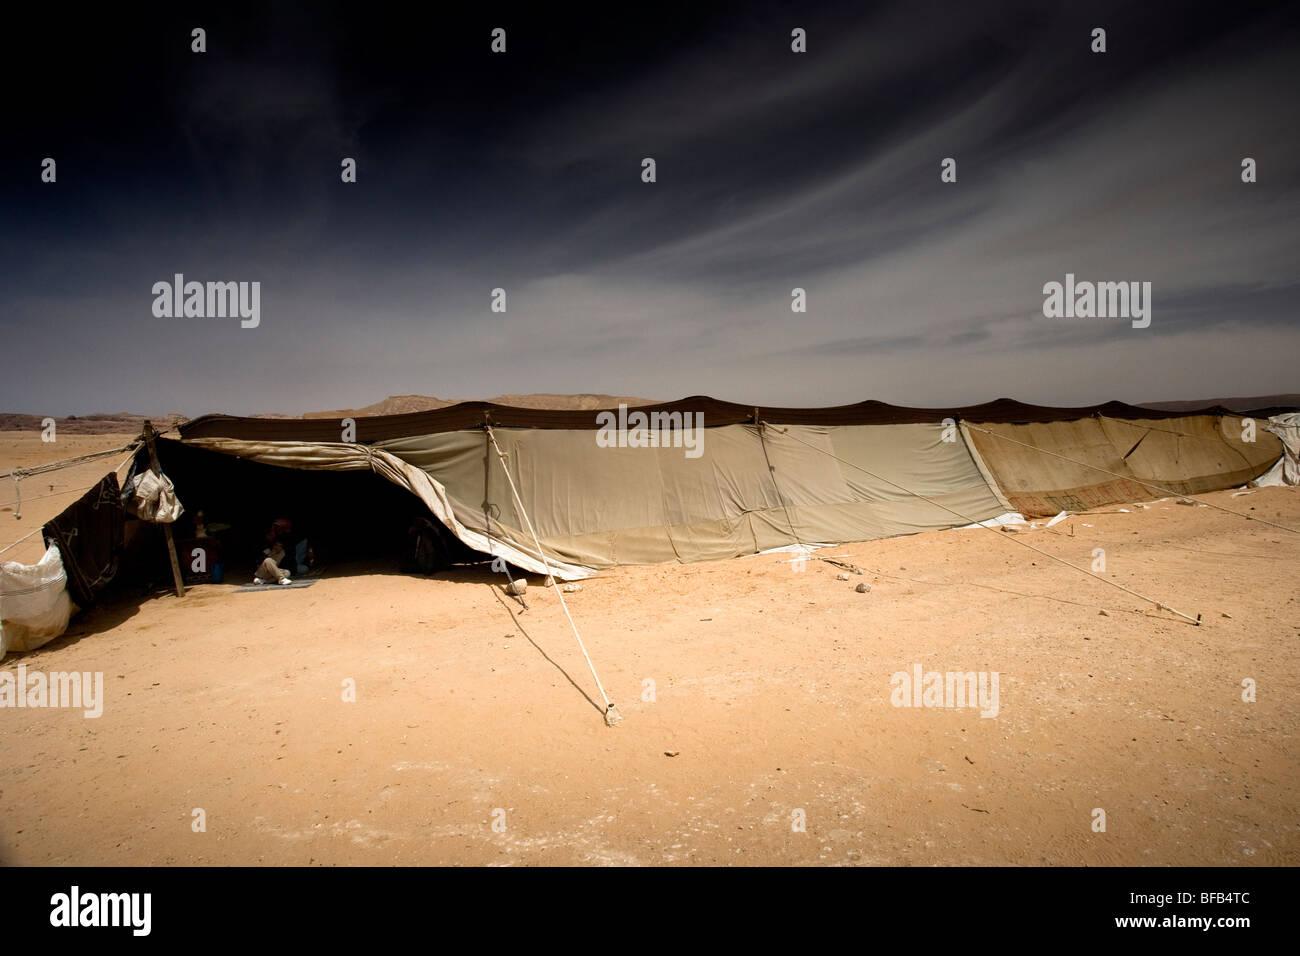 Bedouin camp, Wadi Rum, Jordanien Stockbild